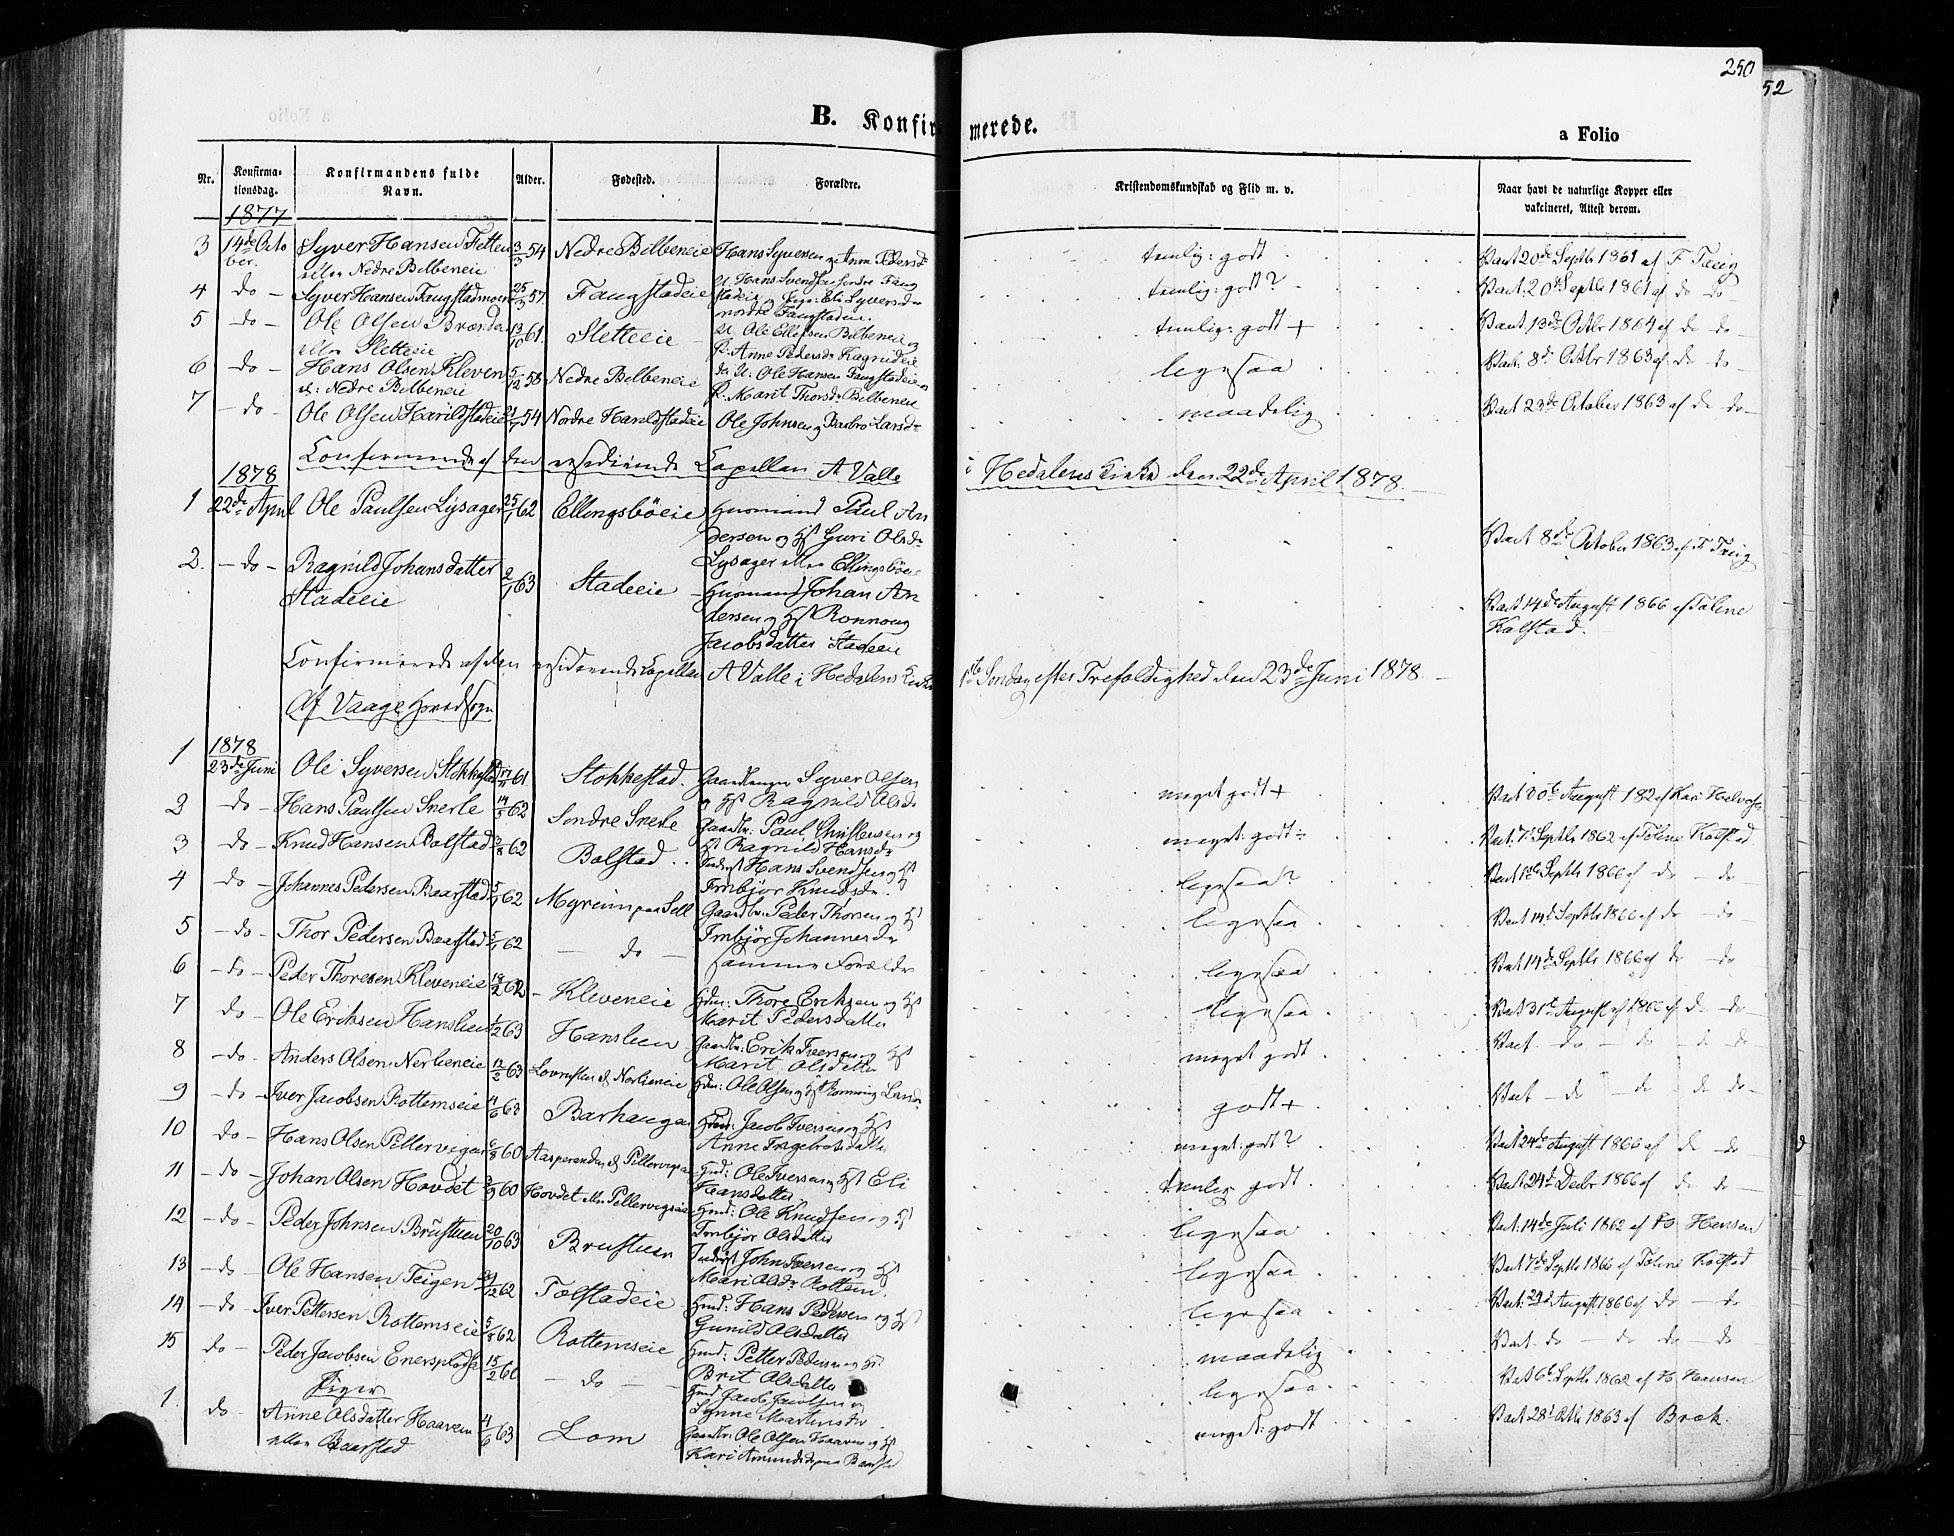 SAH, Vågå prestekontor, Ministerialbok nr. 7 /1, 1872-1886, s. 250